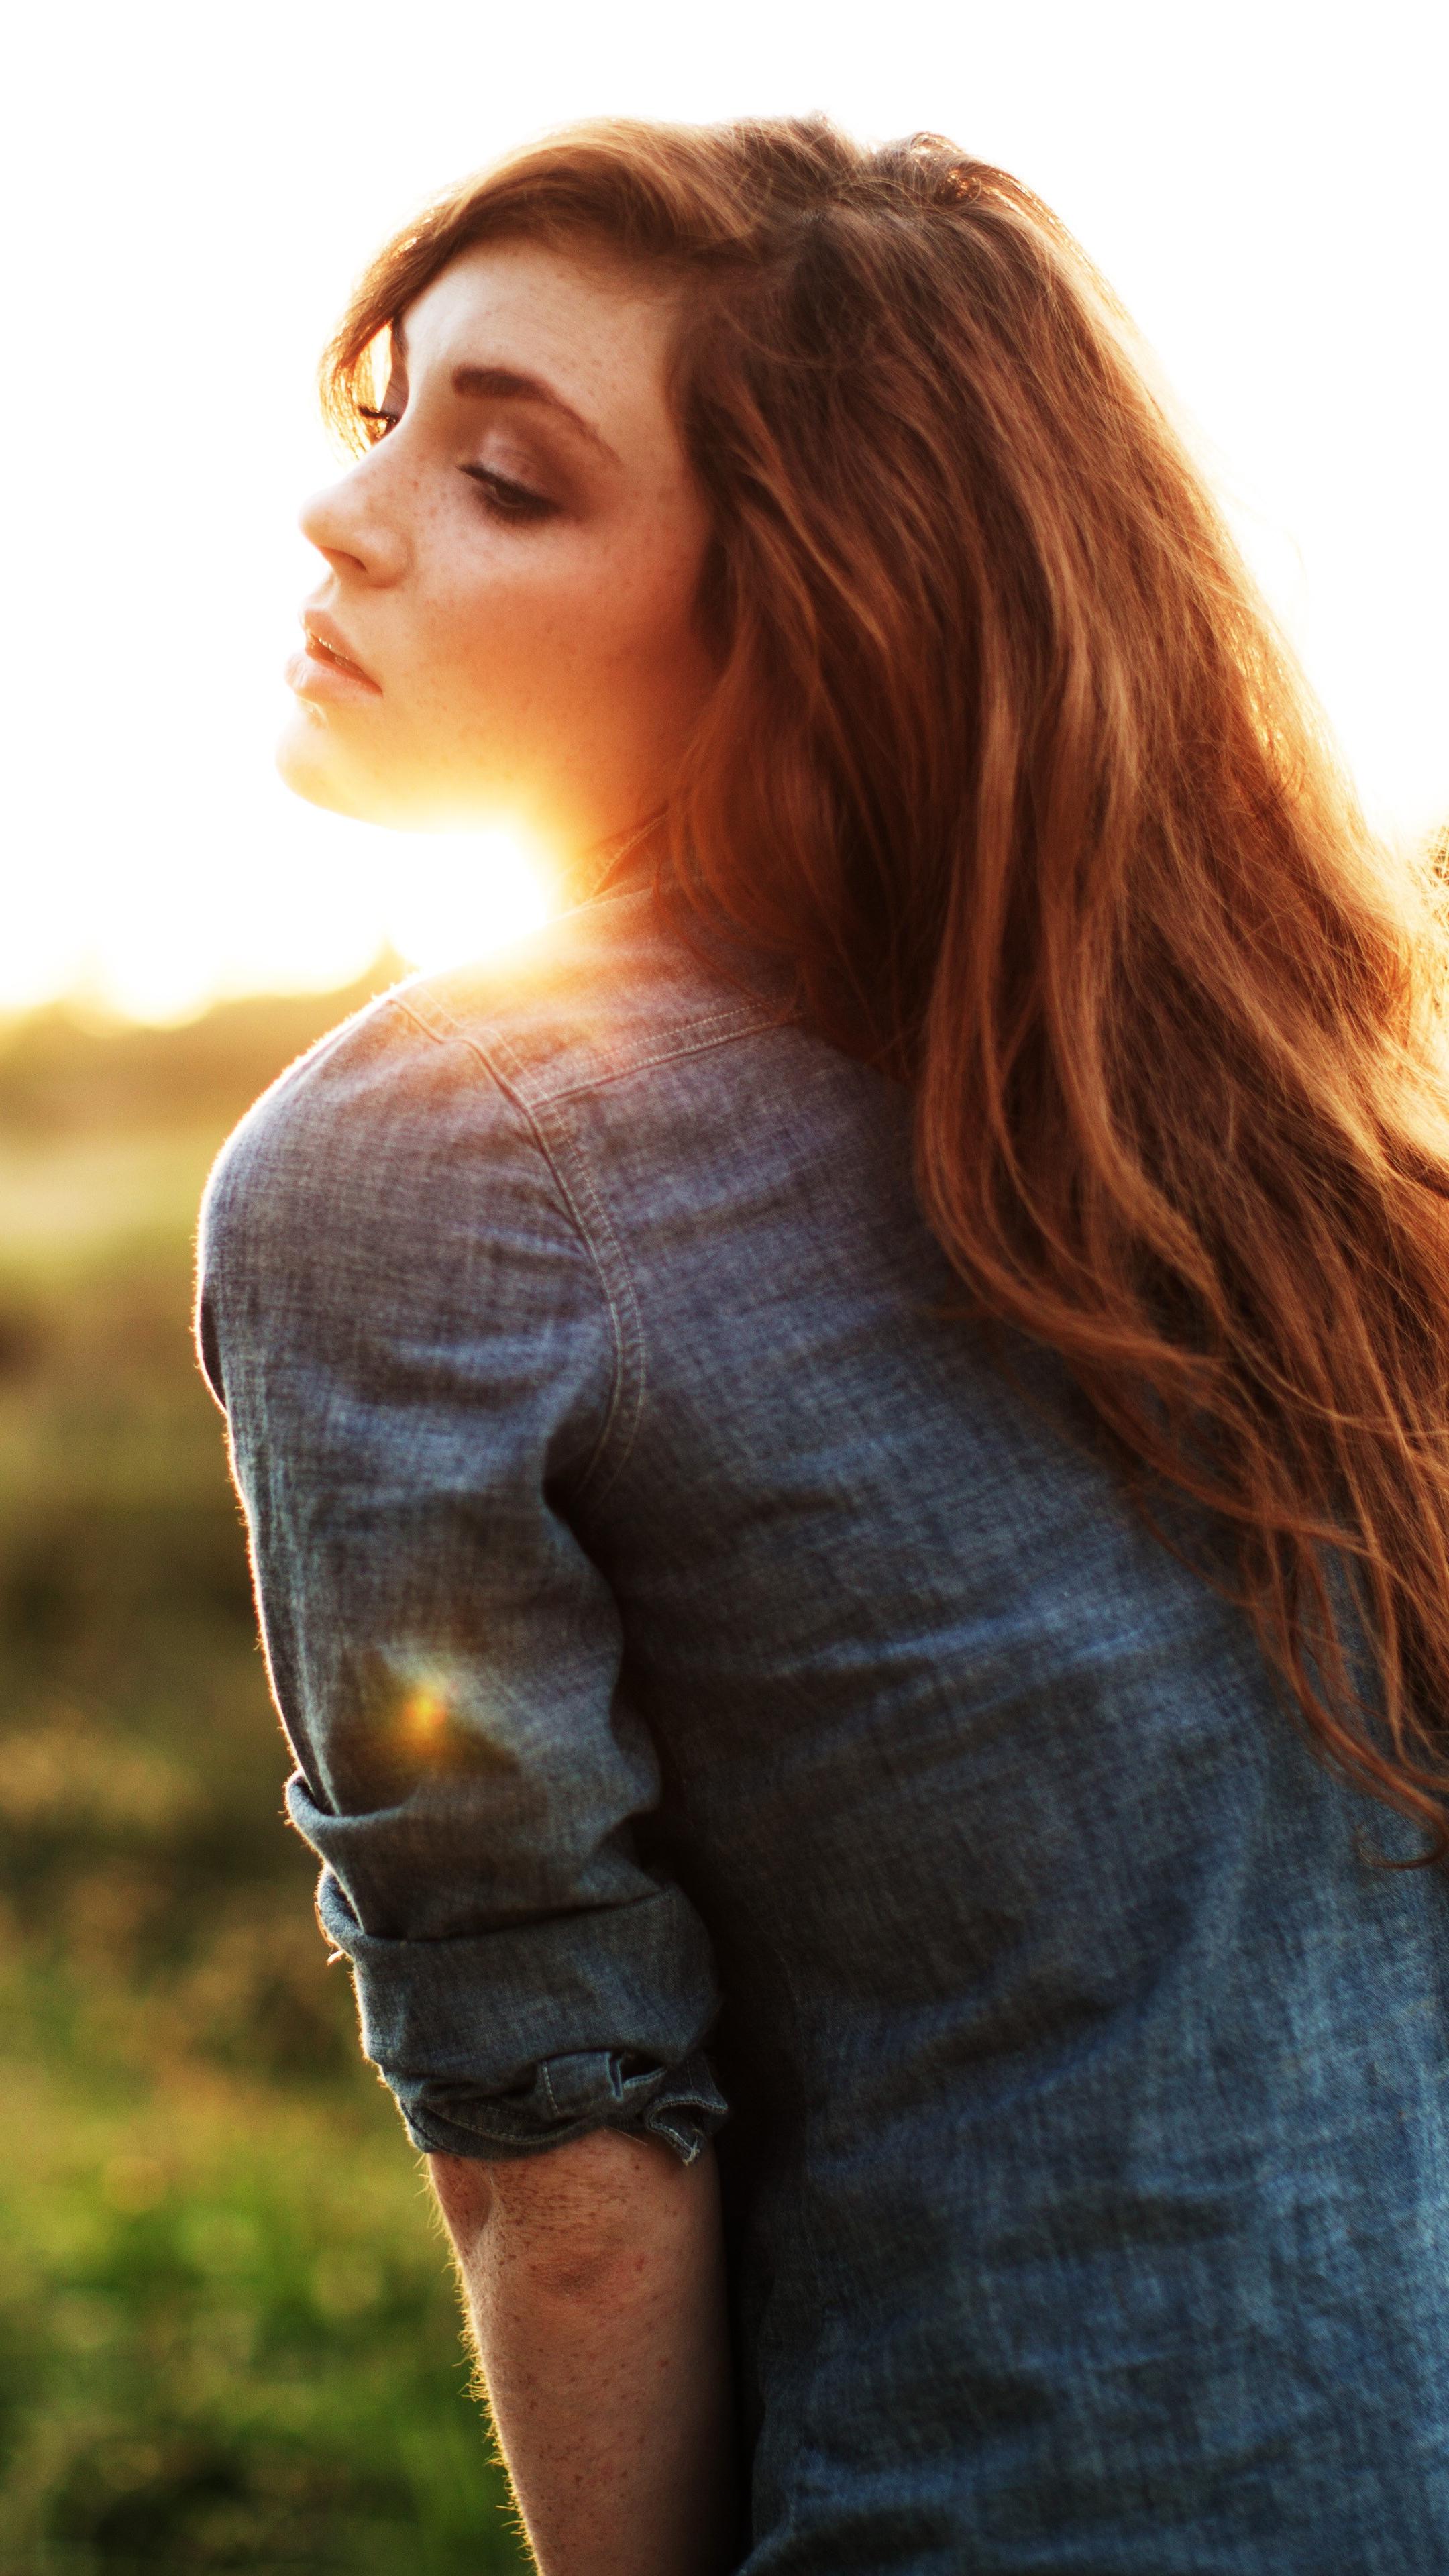 Girl Sunset Brown Hairs Wallpaper iPhone Wallpaper iphoneswallpapers com